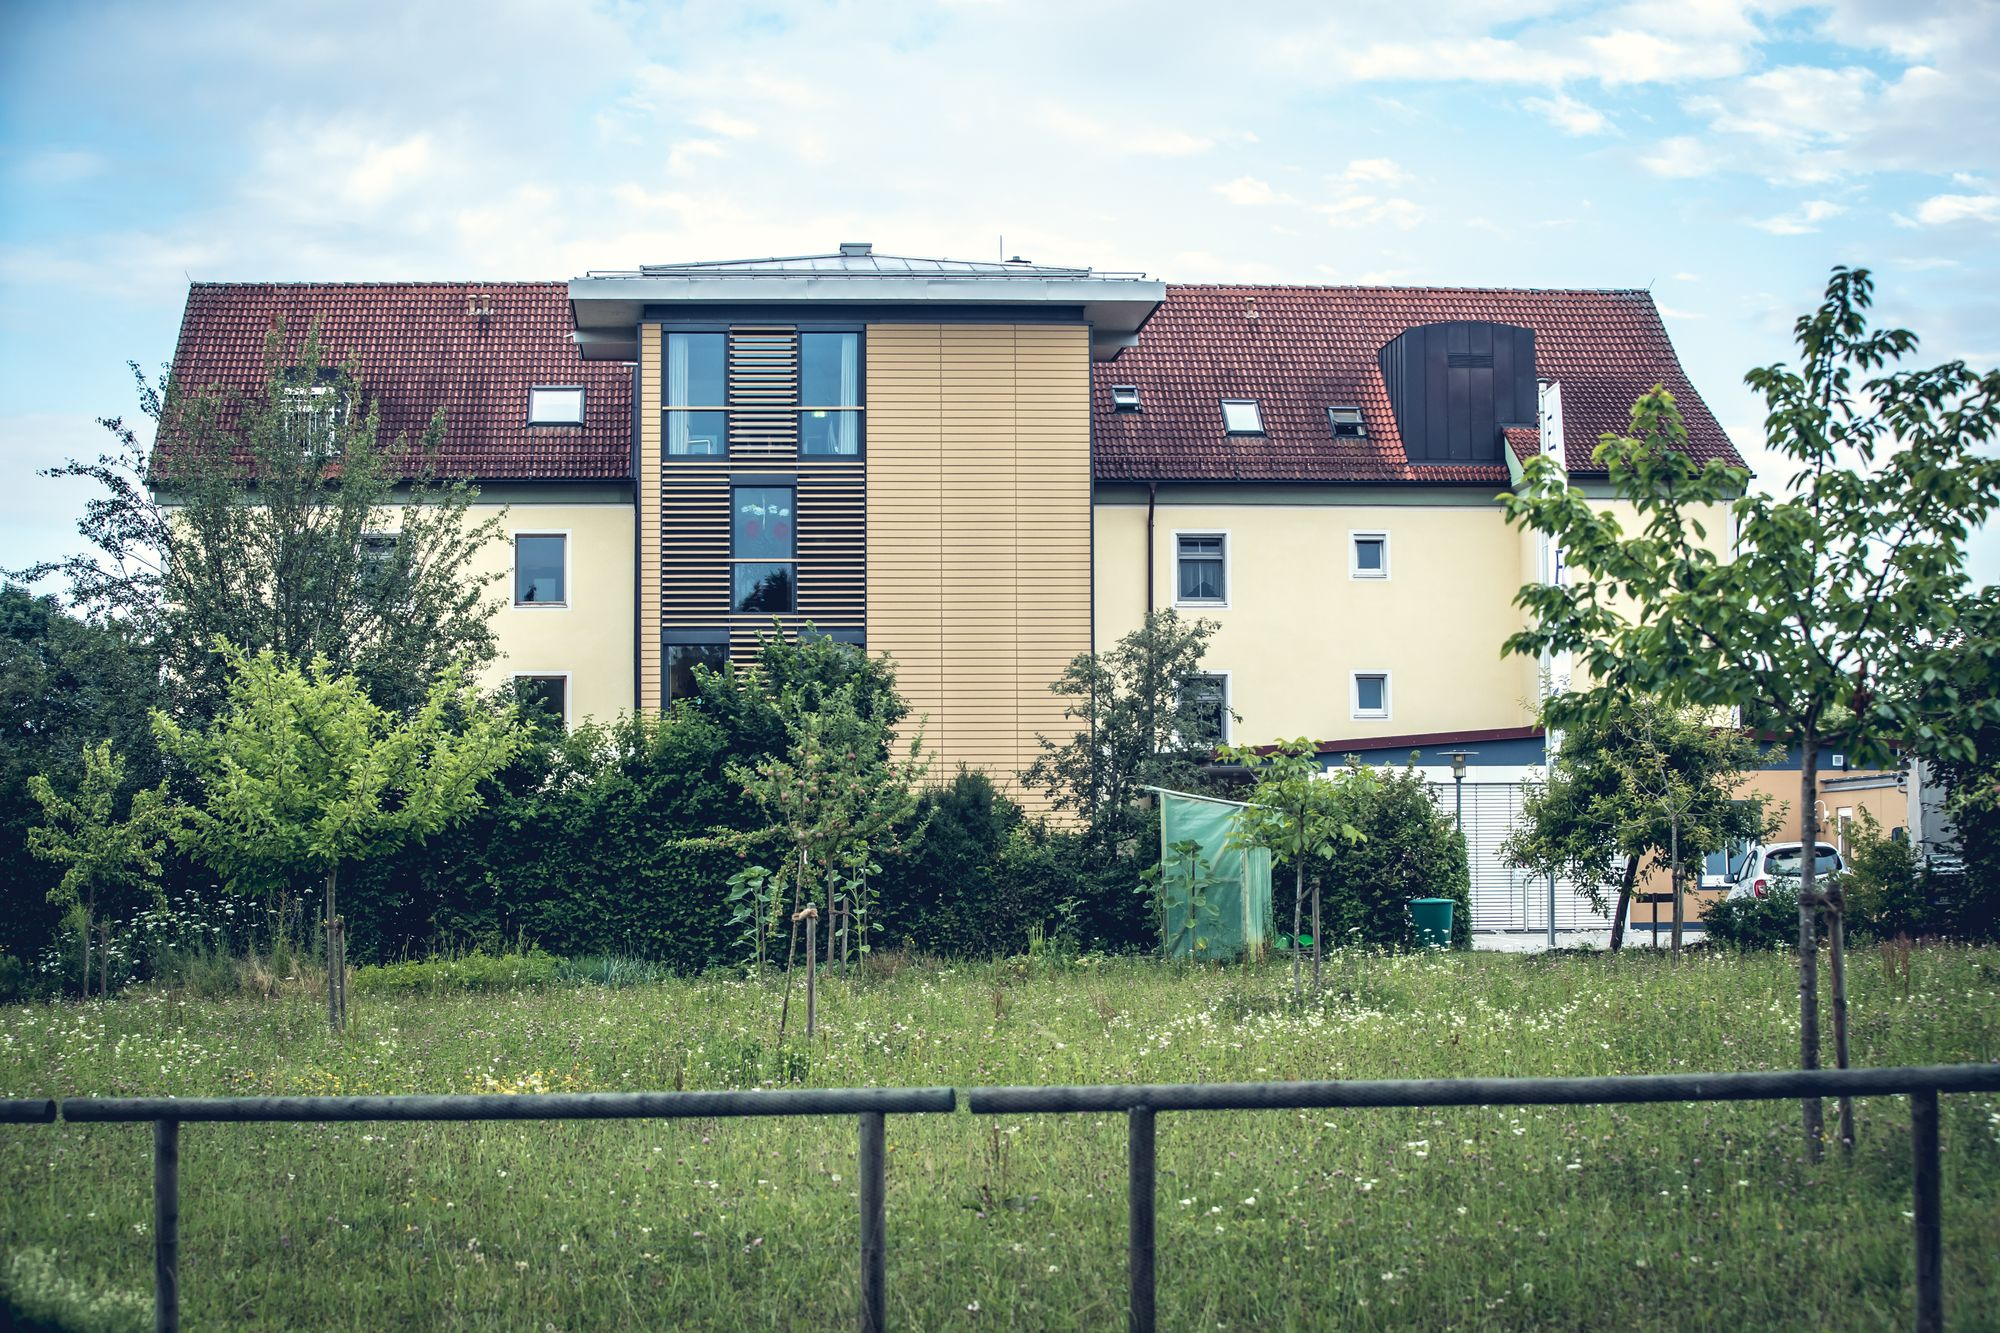 ehrko-wohnzentrum_az1i5958.jpg